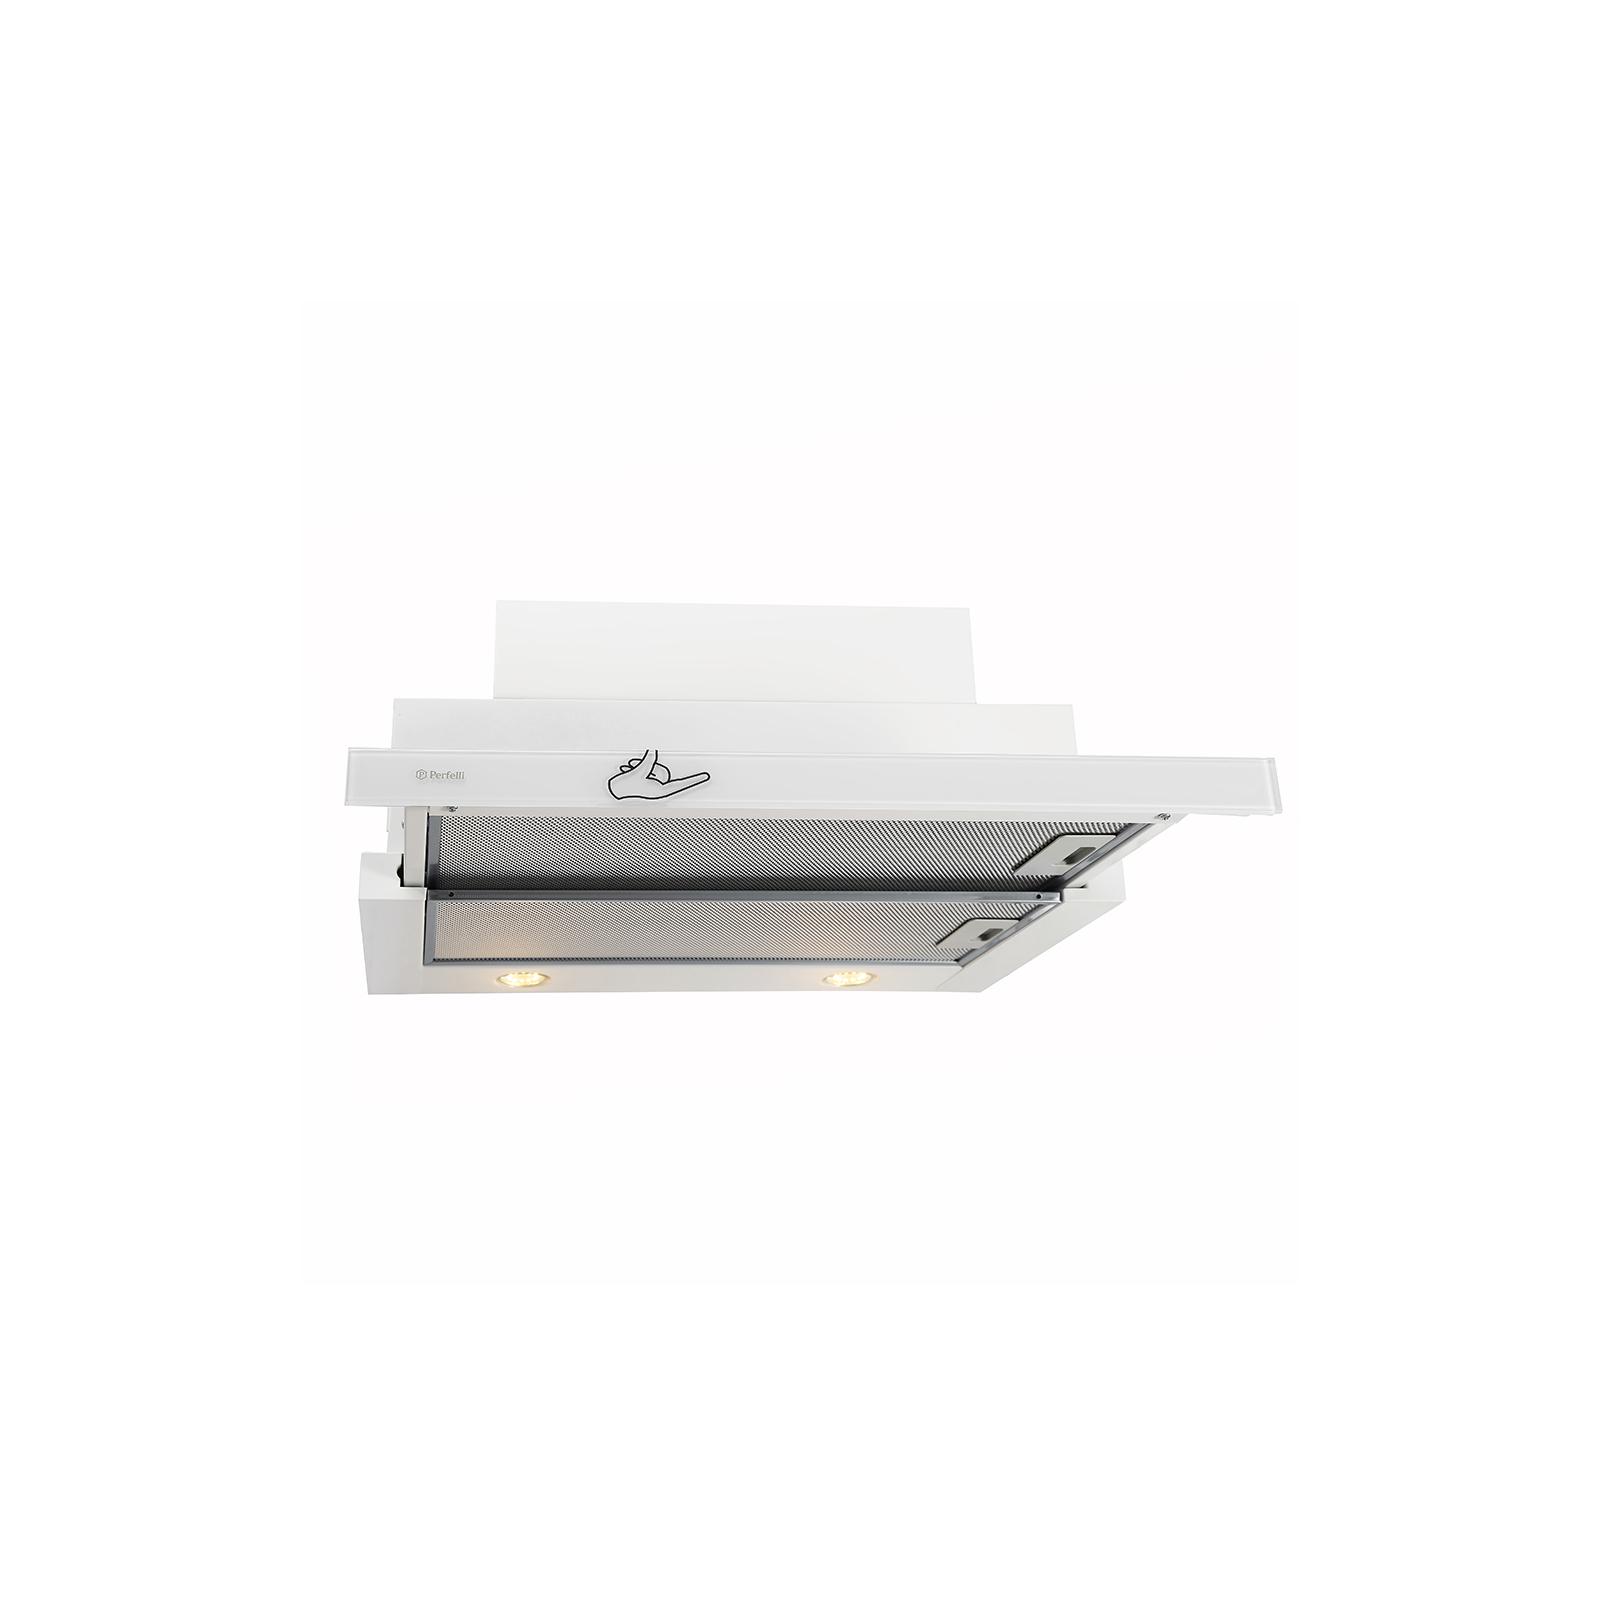 Вытяжка кухонная PERFELLI TLS 6832 W LED изображение 4